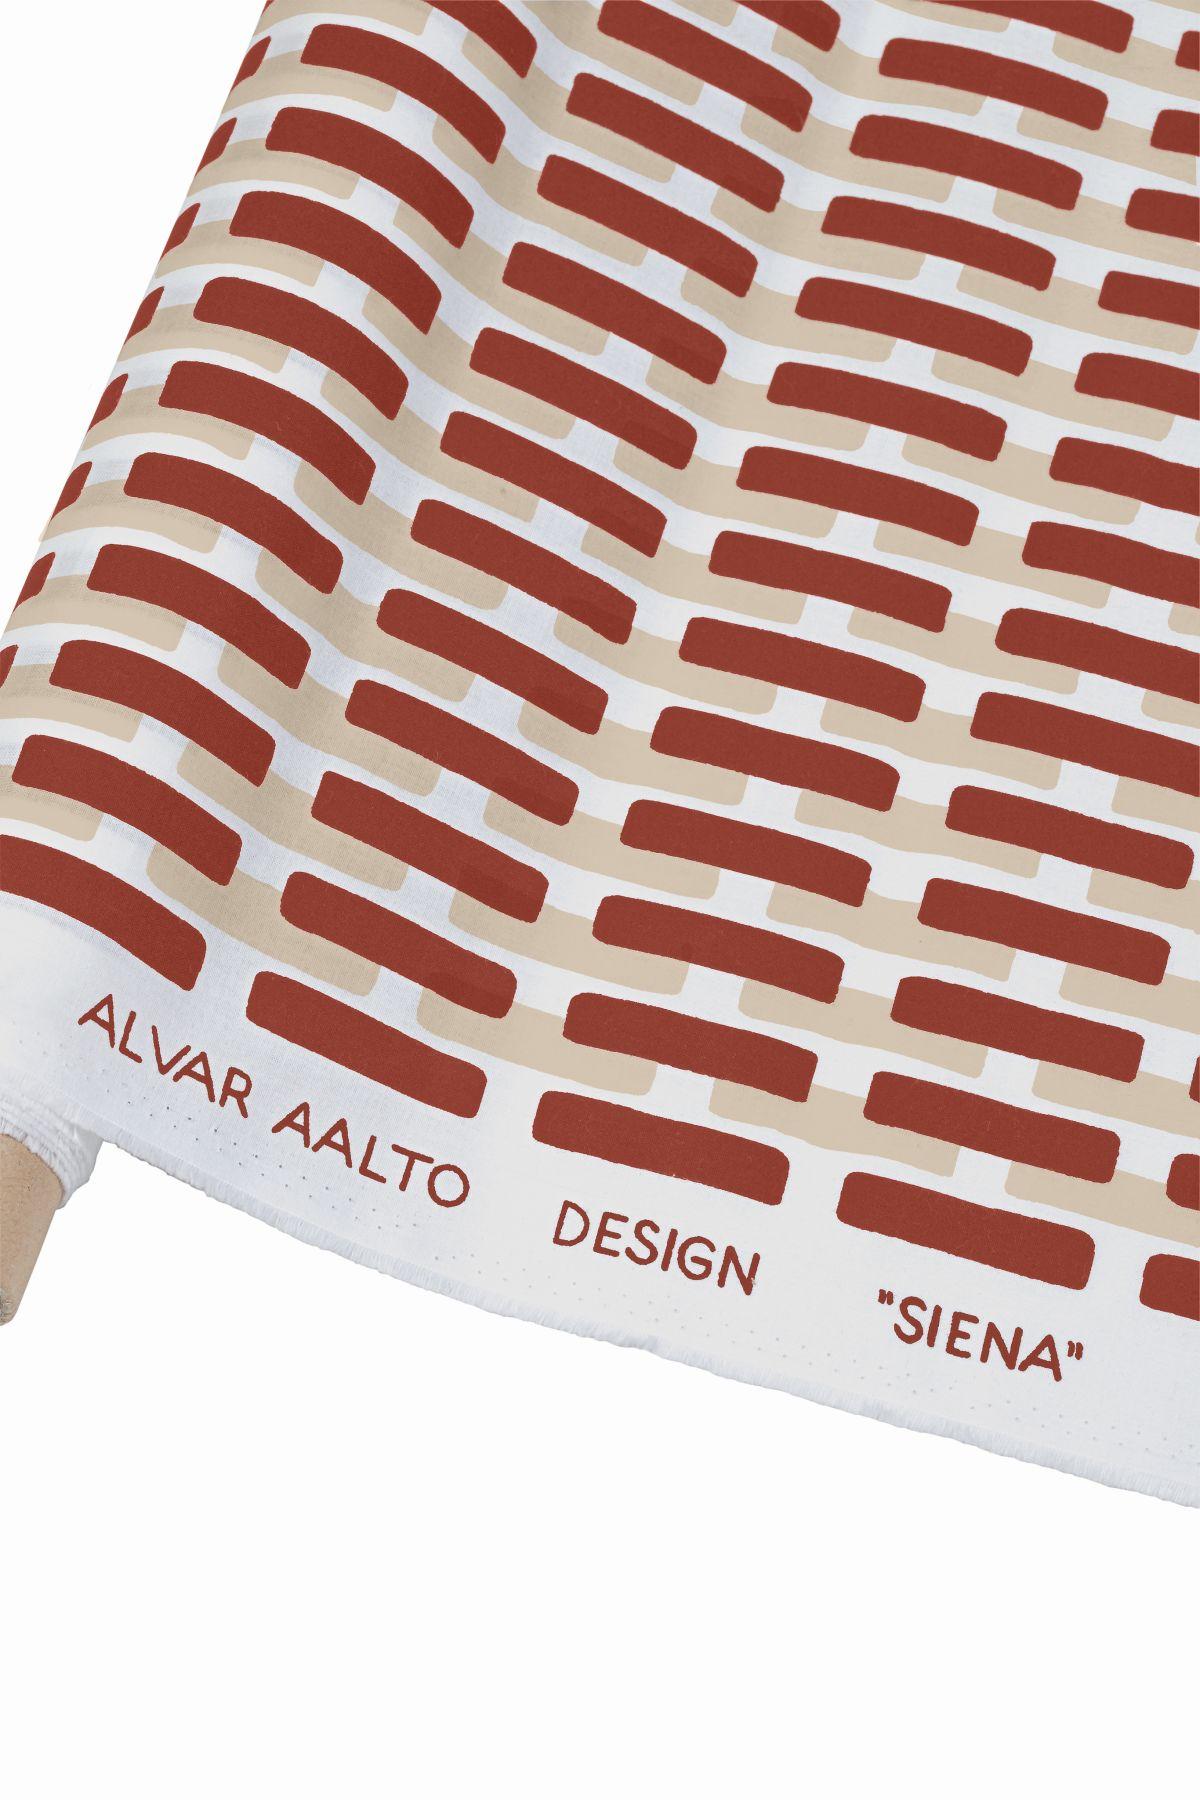 Siena-Fabric-brick-sand-shadow-3976784